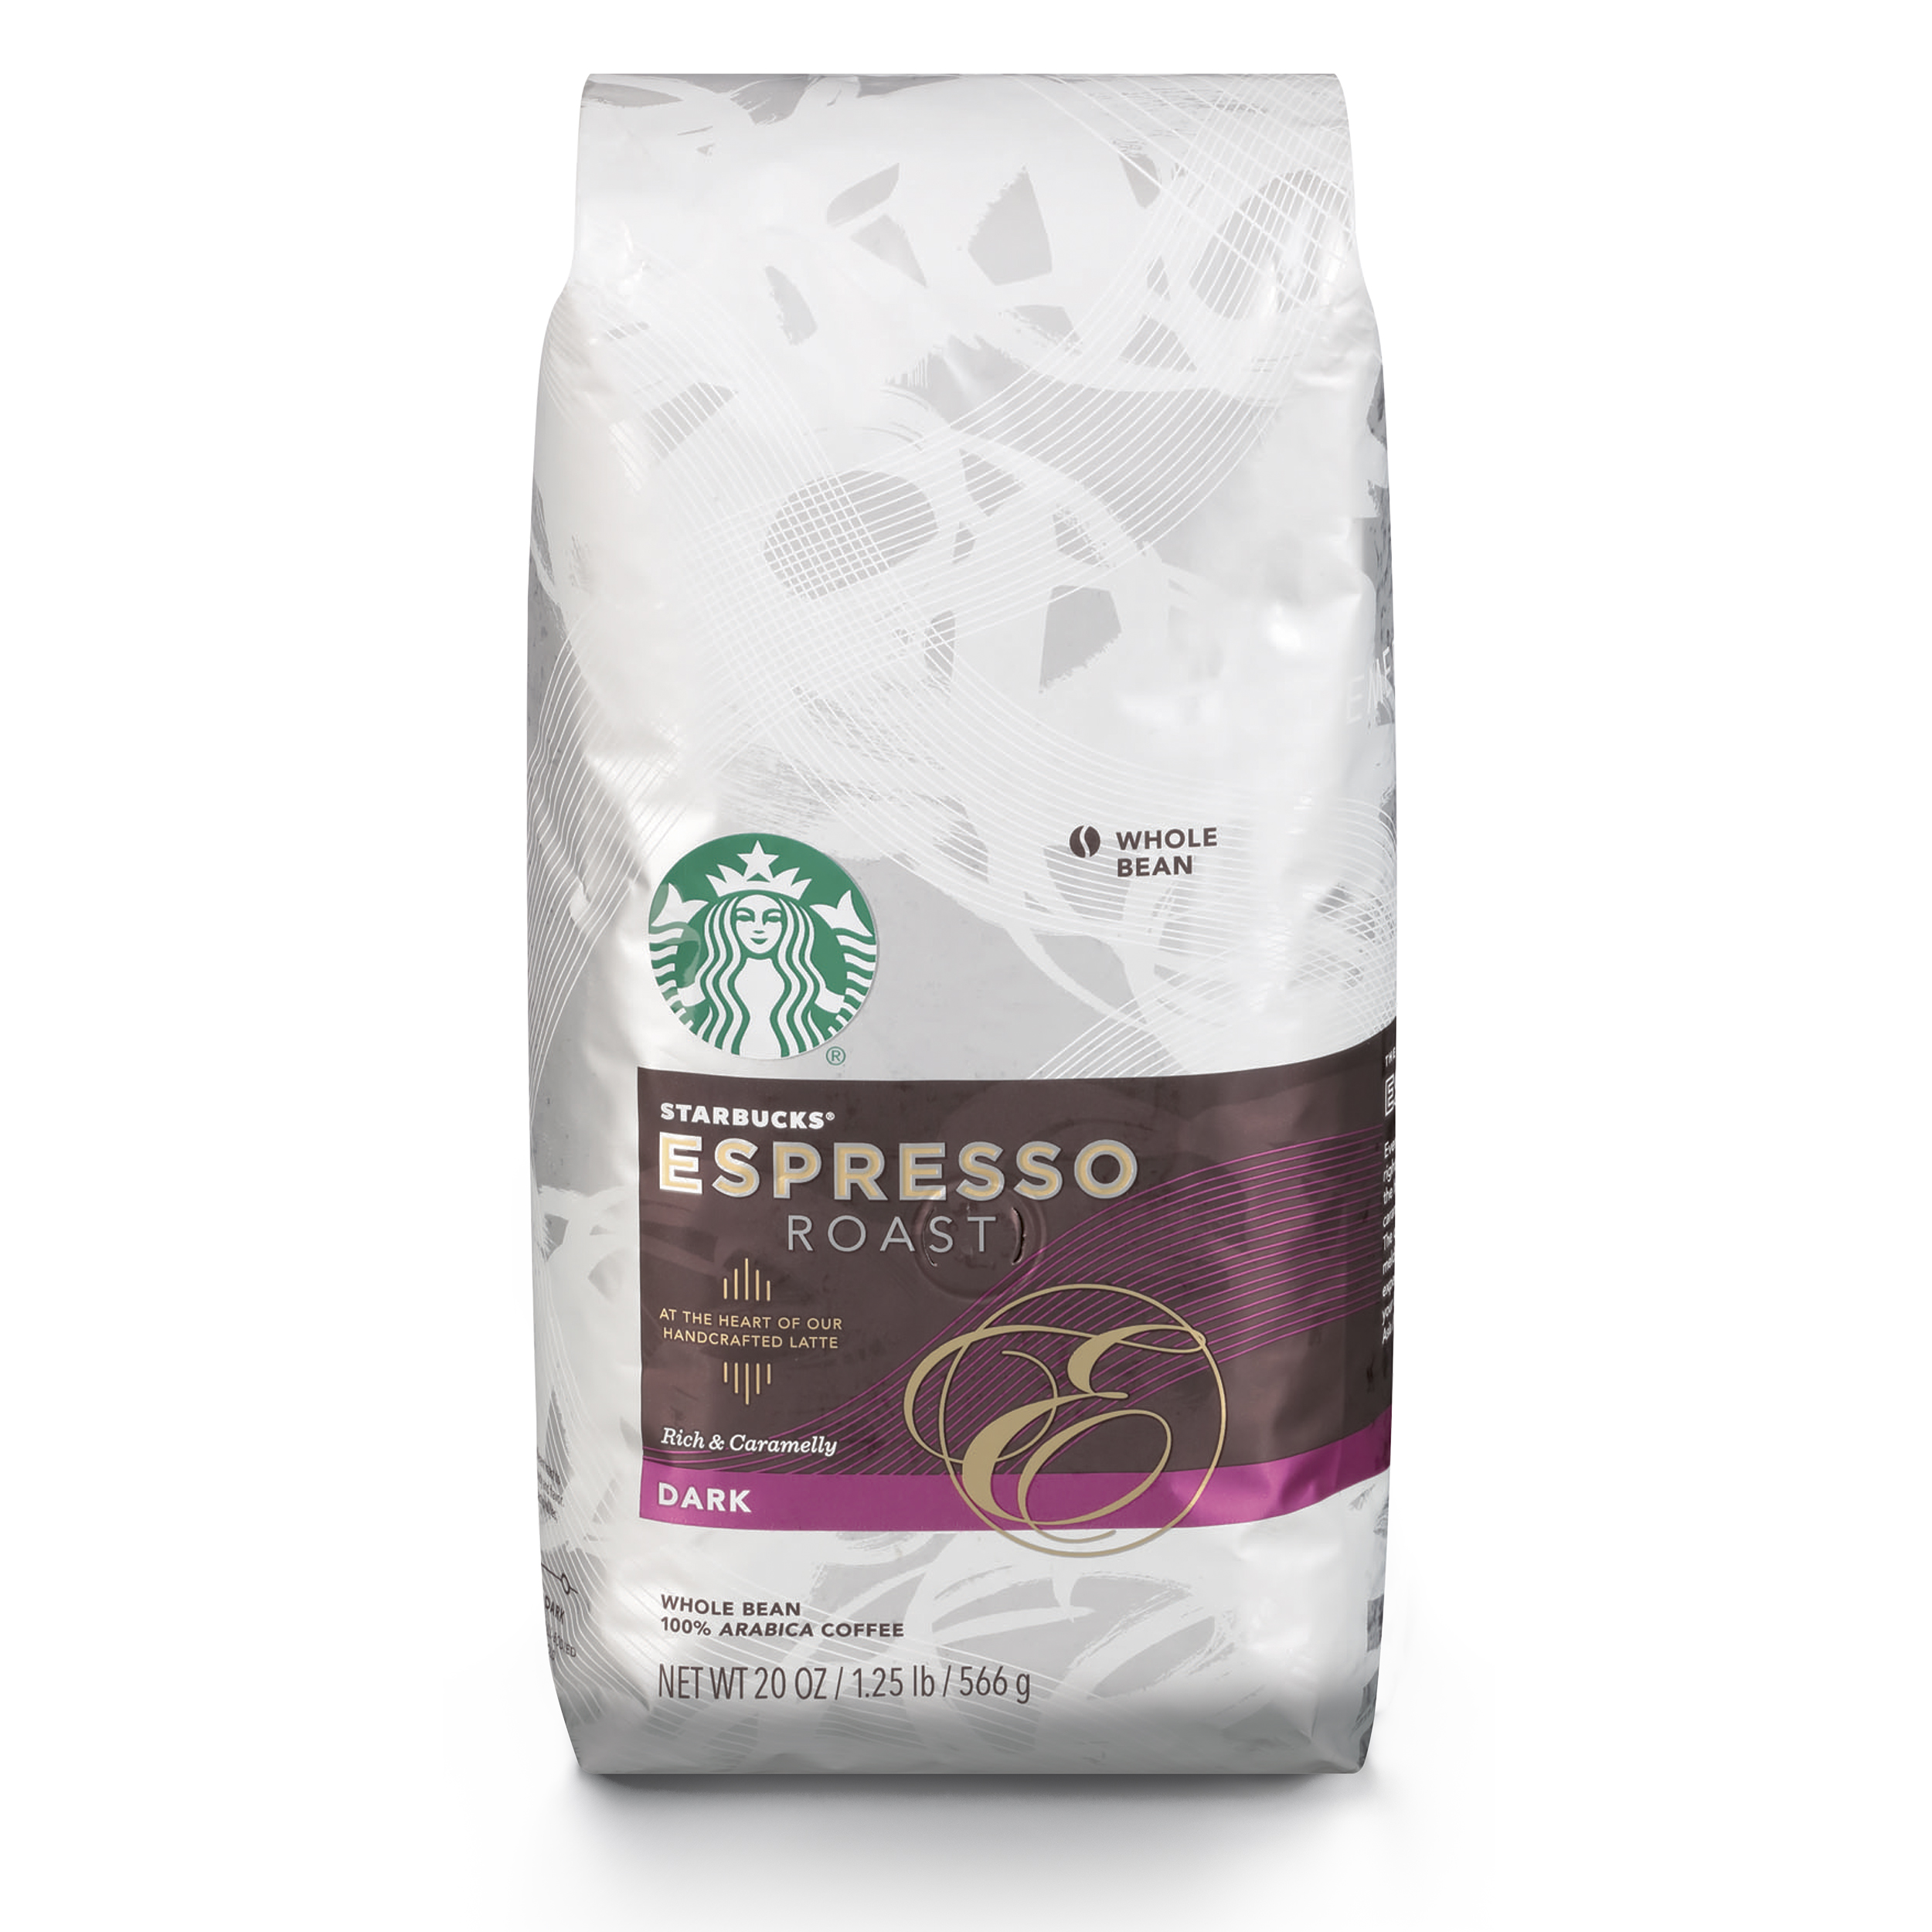 Starbucks Espresso Dark Roast Whole Bean Coffee, 20-Ounce Bag ...